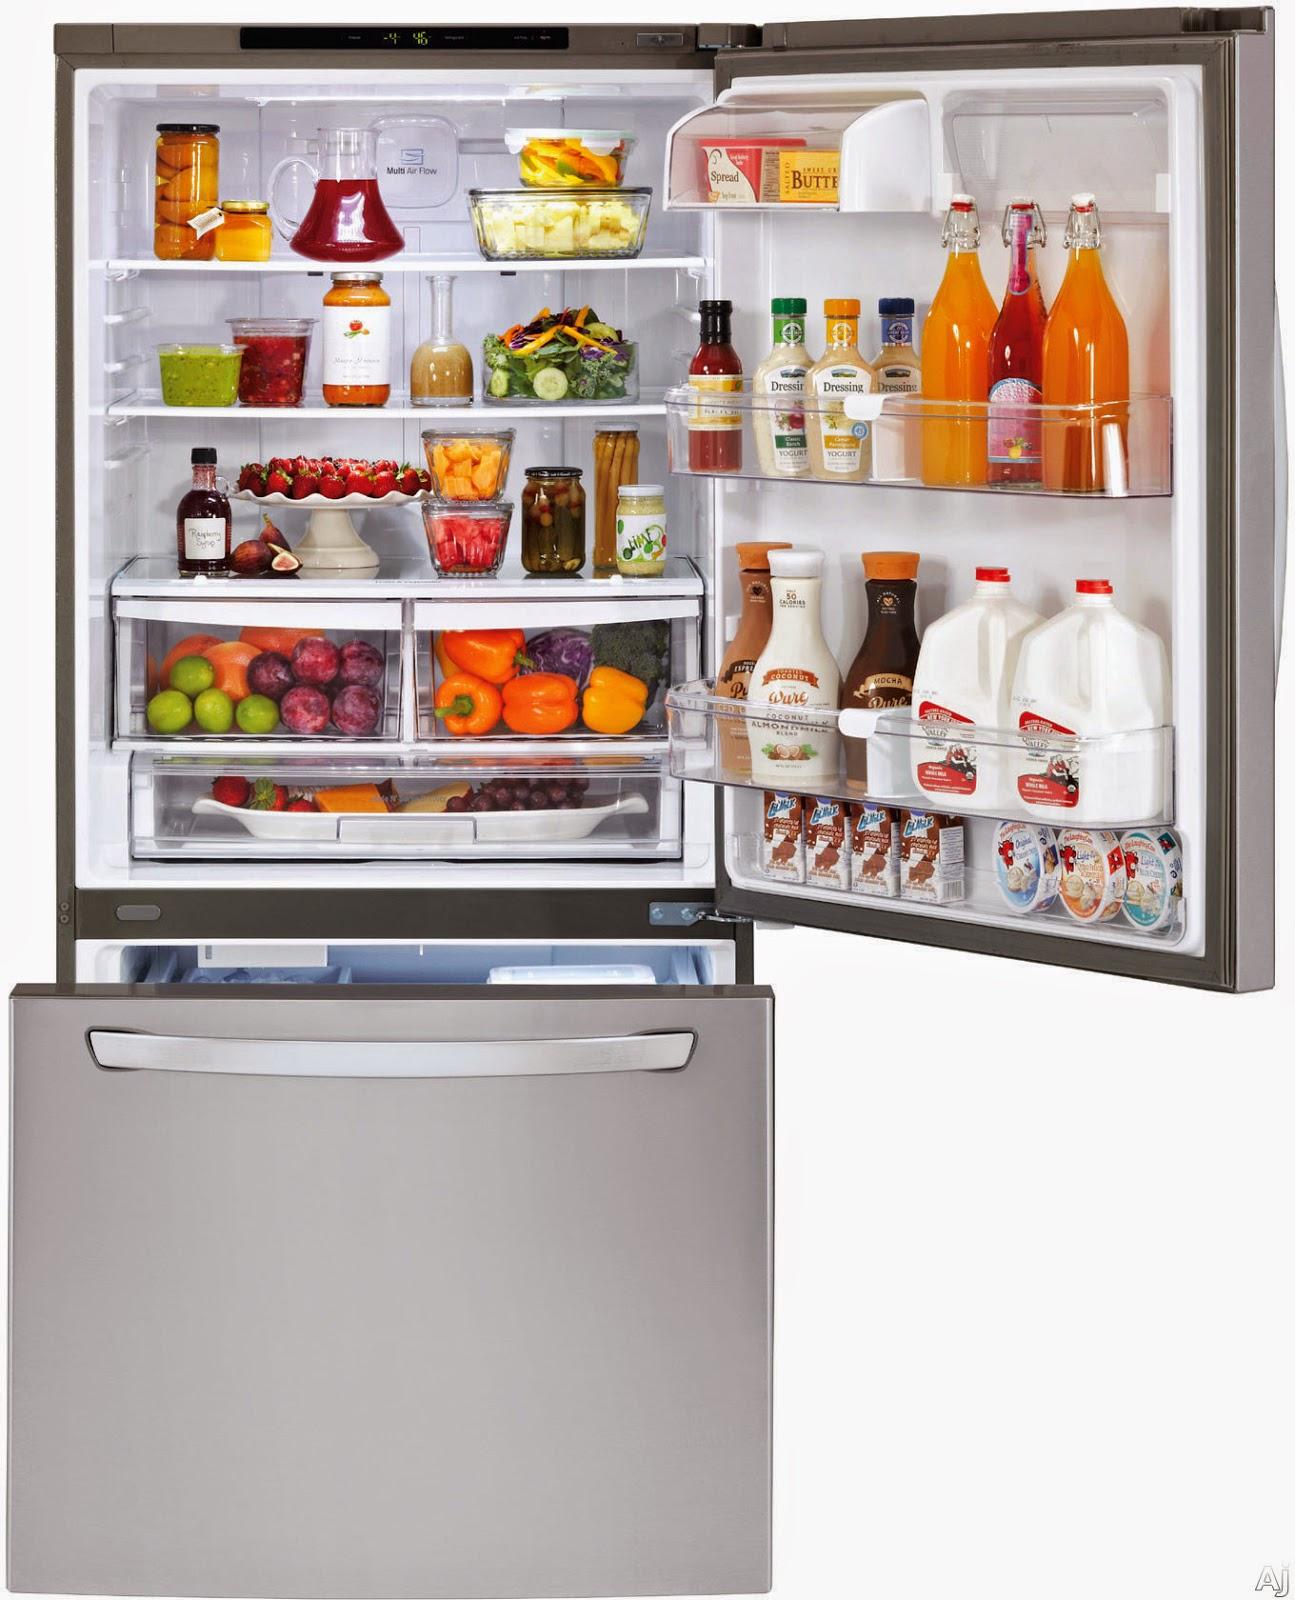 LG LDC22720ST Bottom Freezer Refrigerator